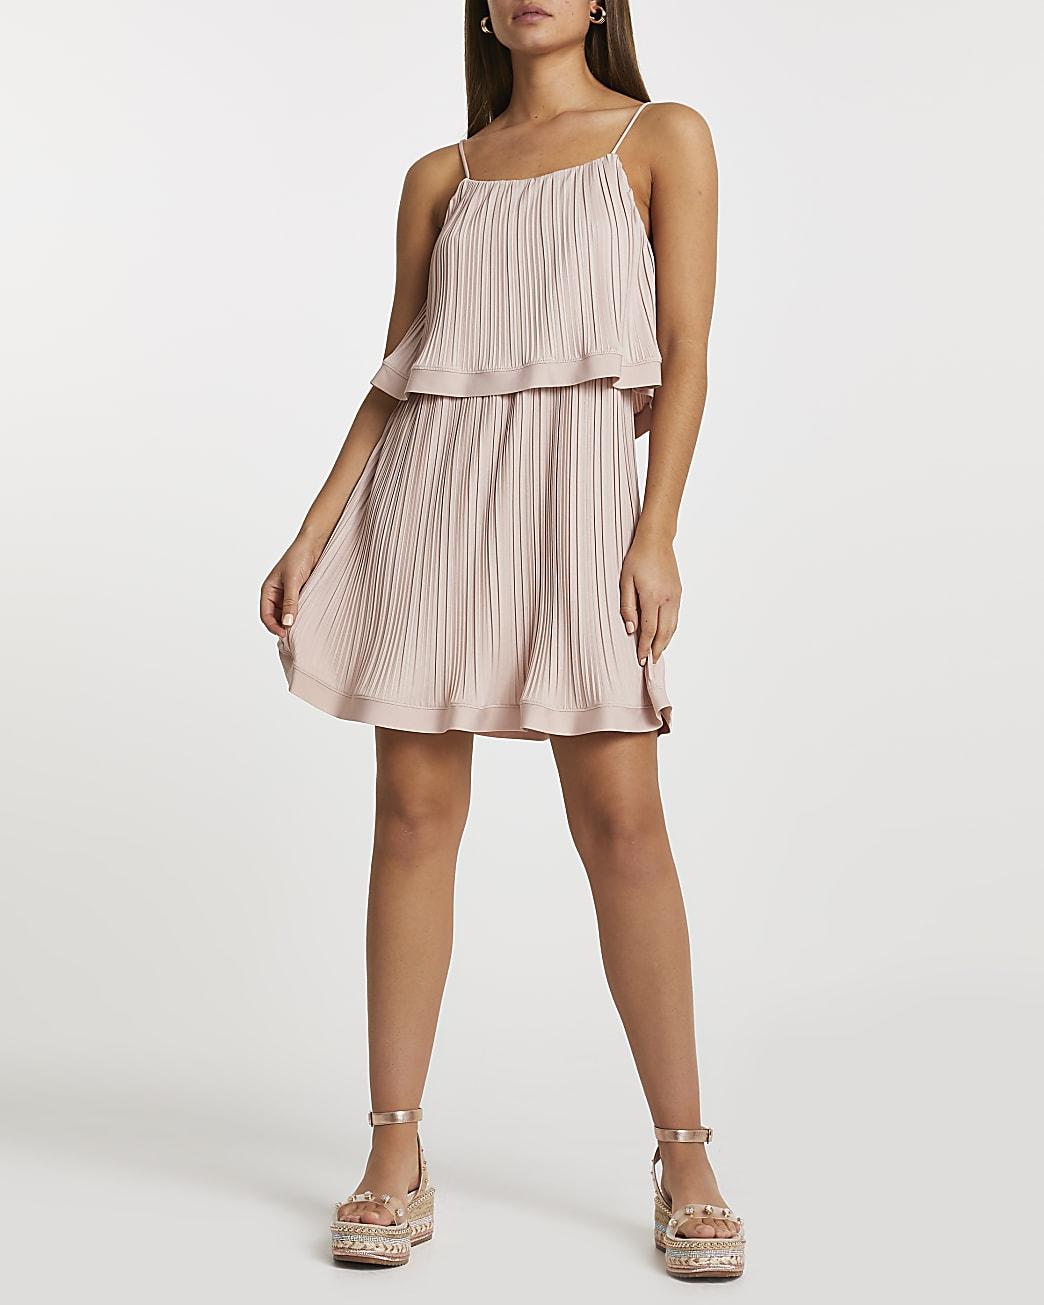 Pink pleated layered mini dress